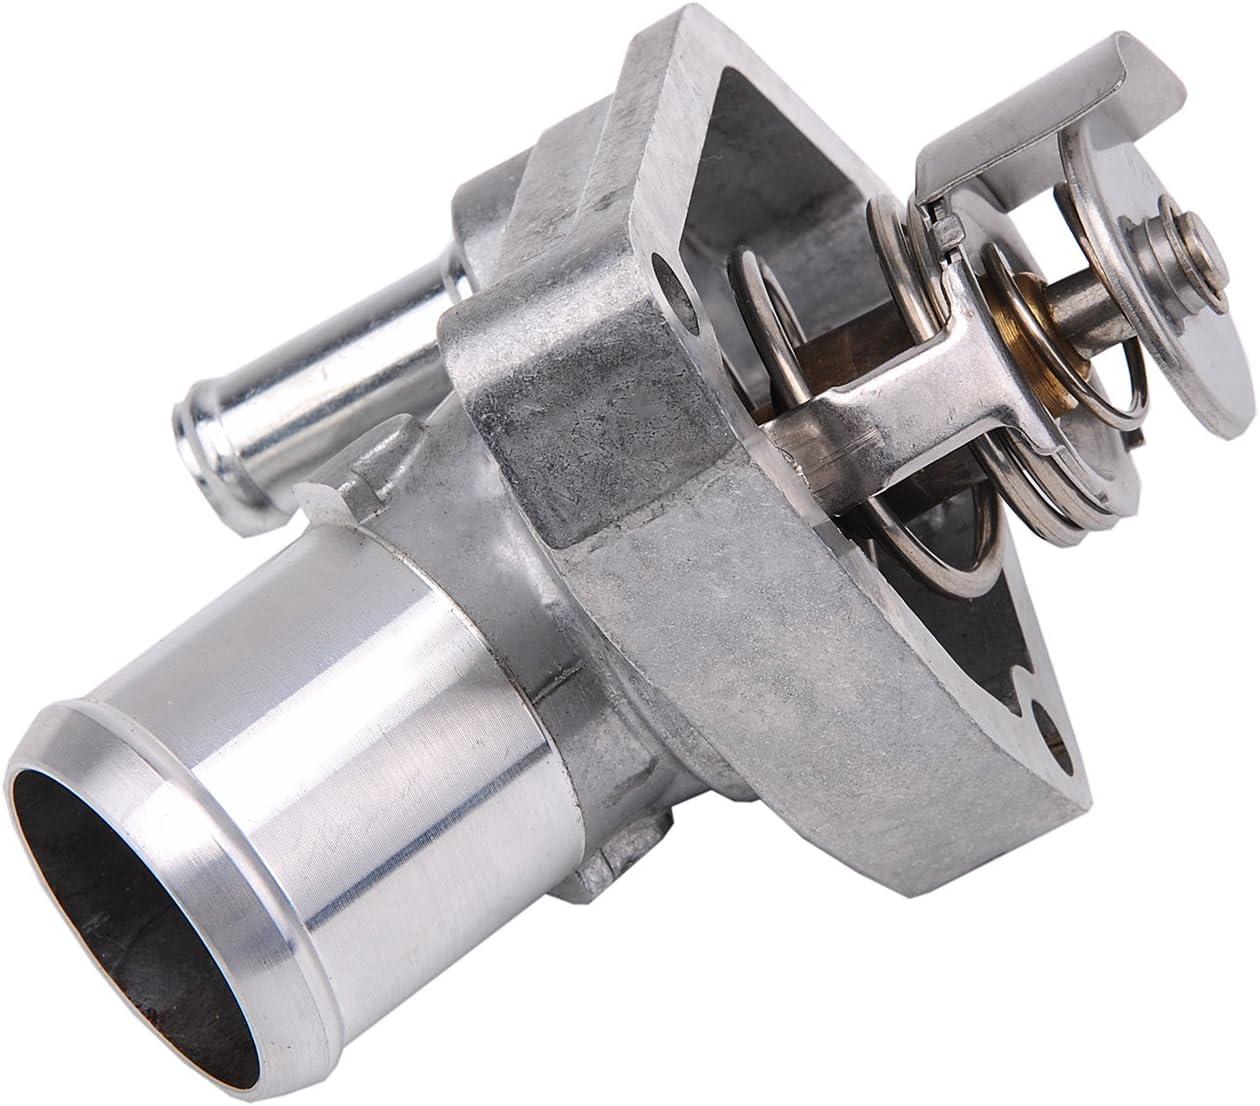 NEW OEM NISSAN INFINITI Thermostat /& Gasket 2120031U1B G35 M35 FRONTIER XTERRA